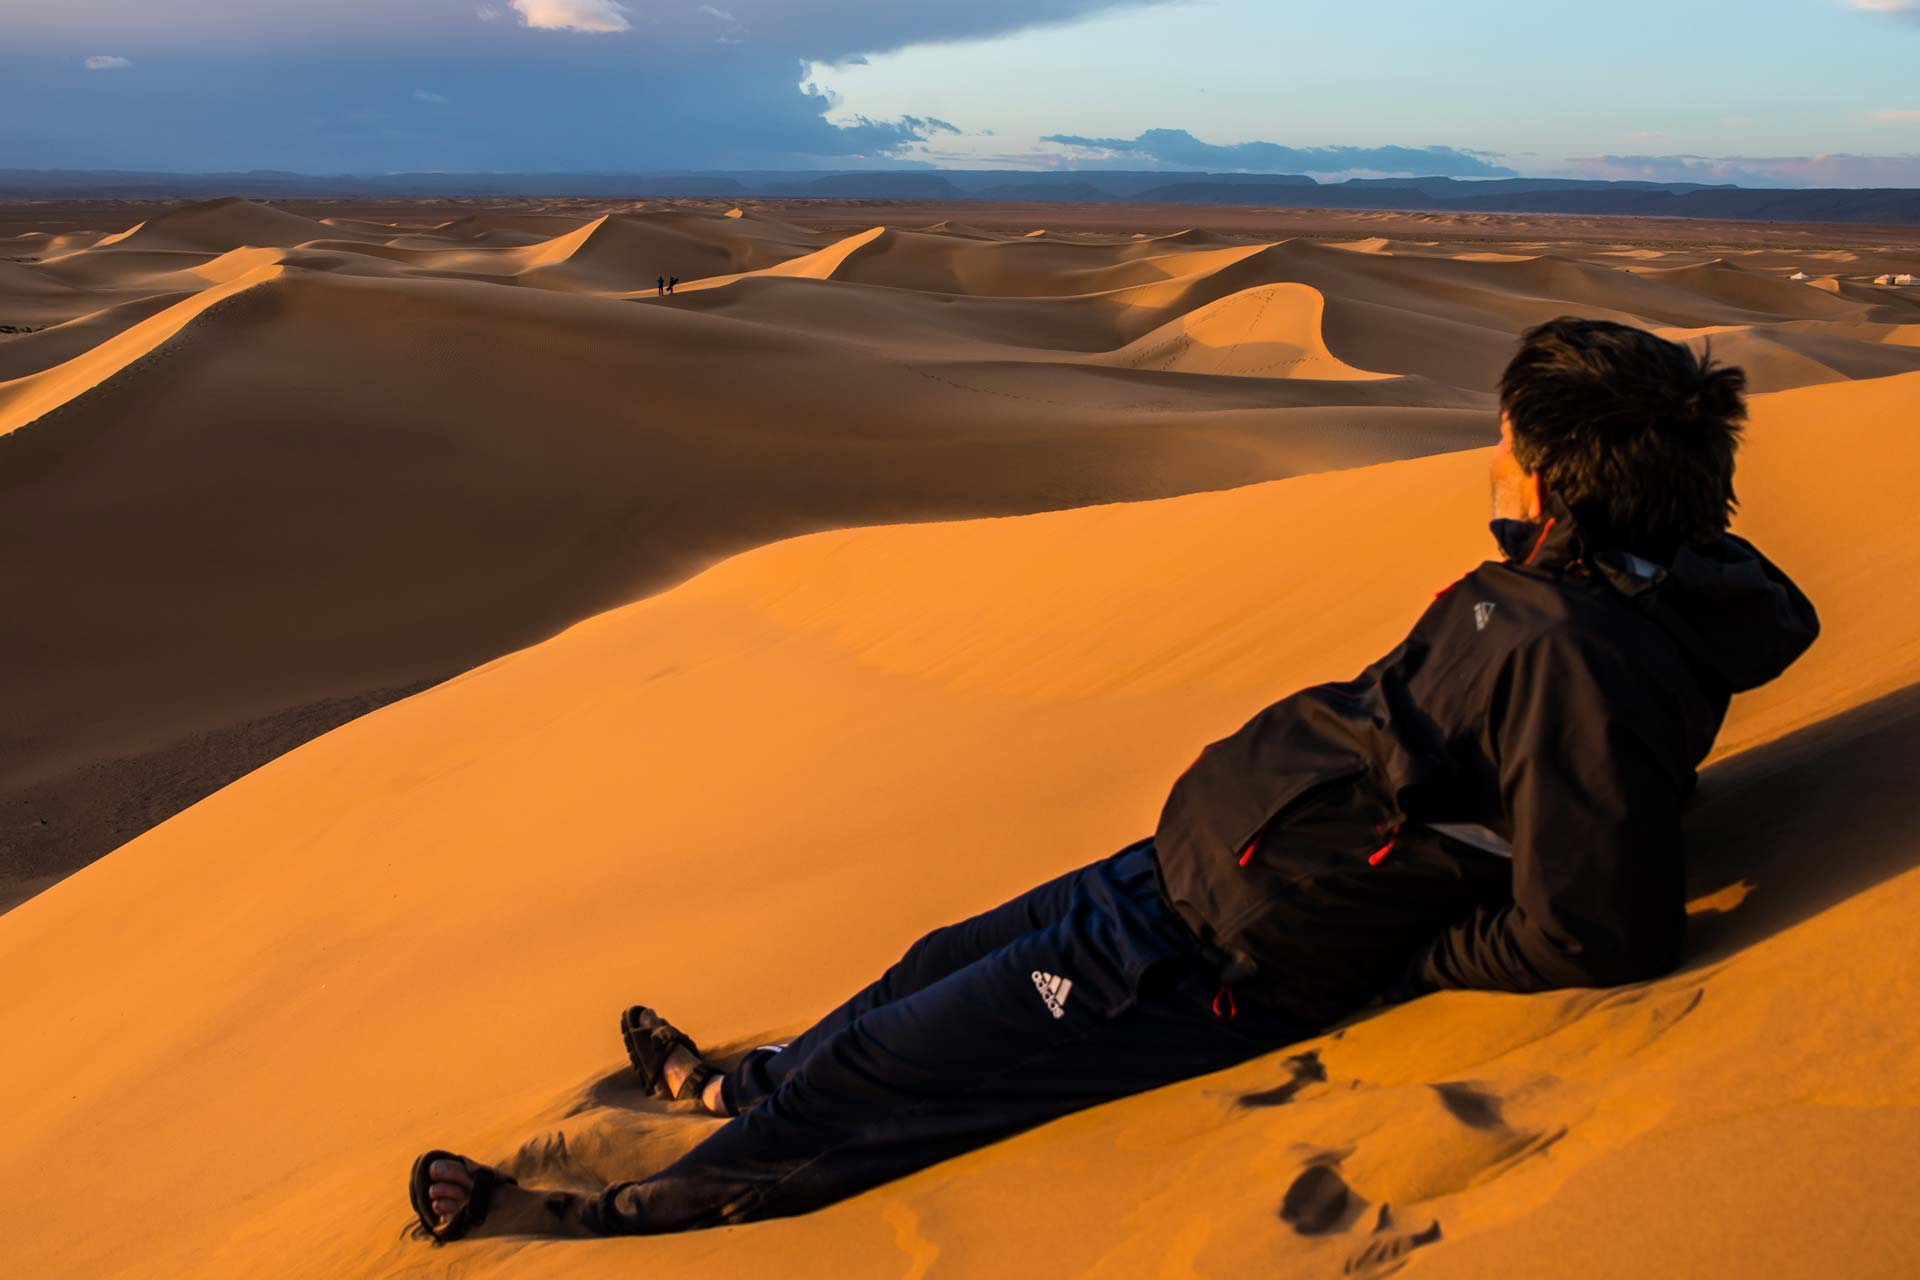 Marokko - Reisefotografie Sahara